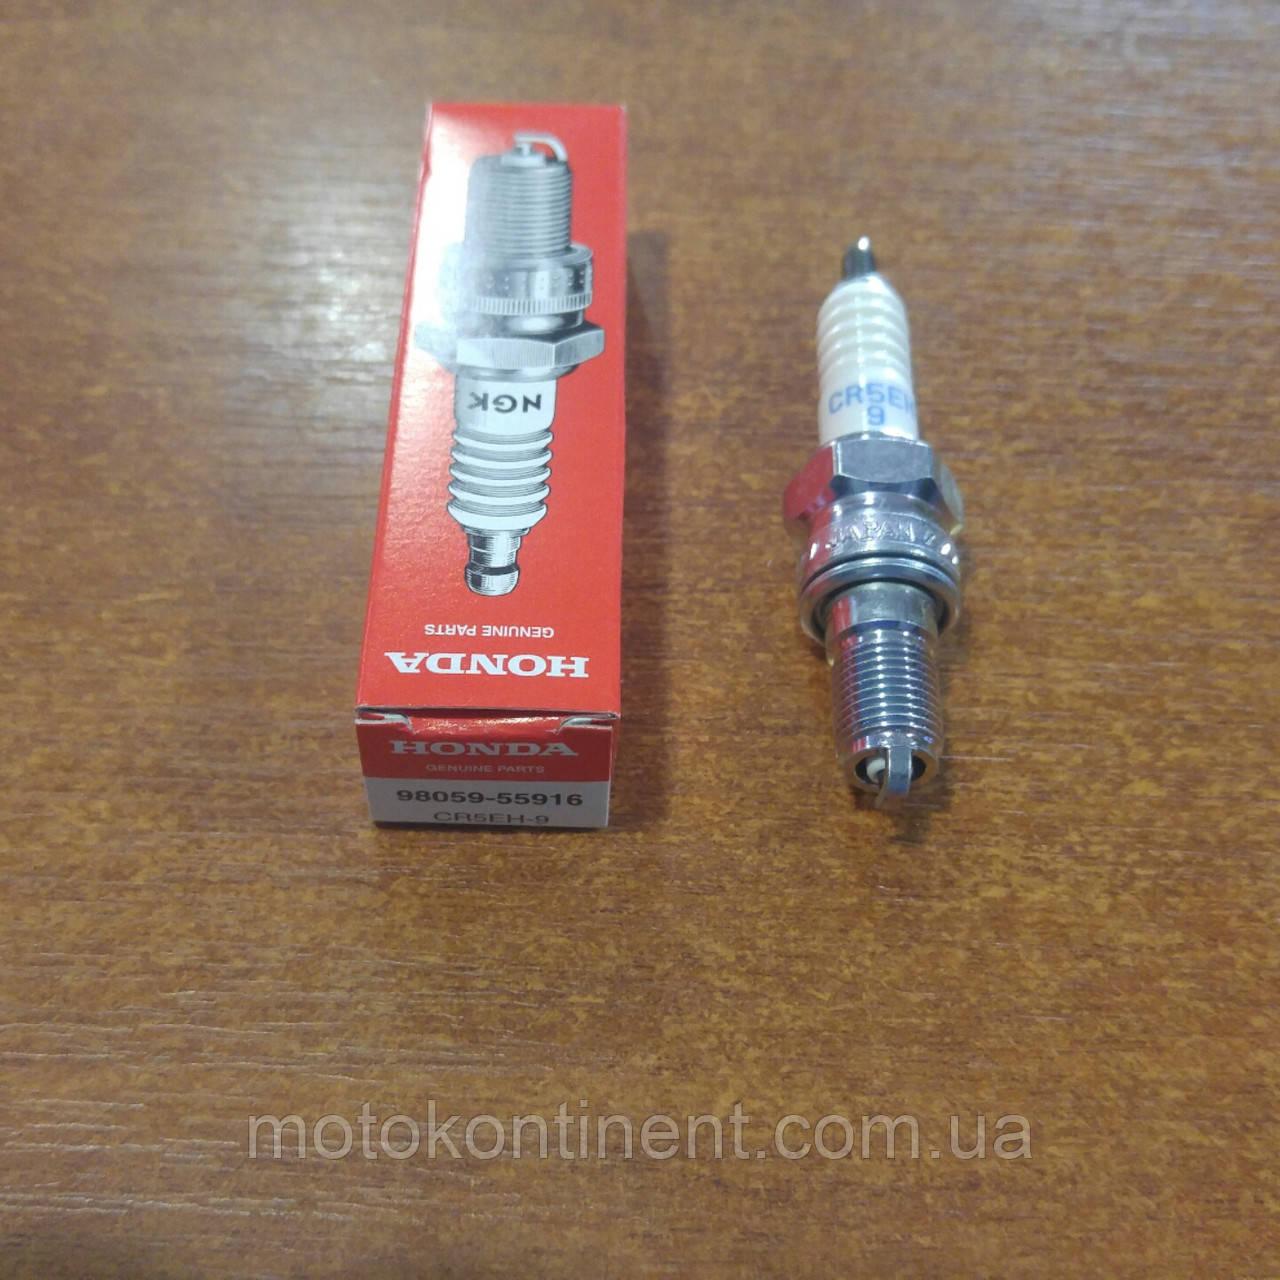 98059-55916 CR5EH9 Свеча зажигания Honda BF8/BF10/BF15/BF20